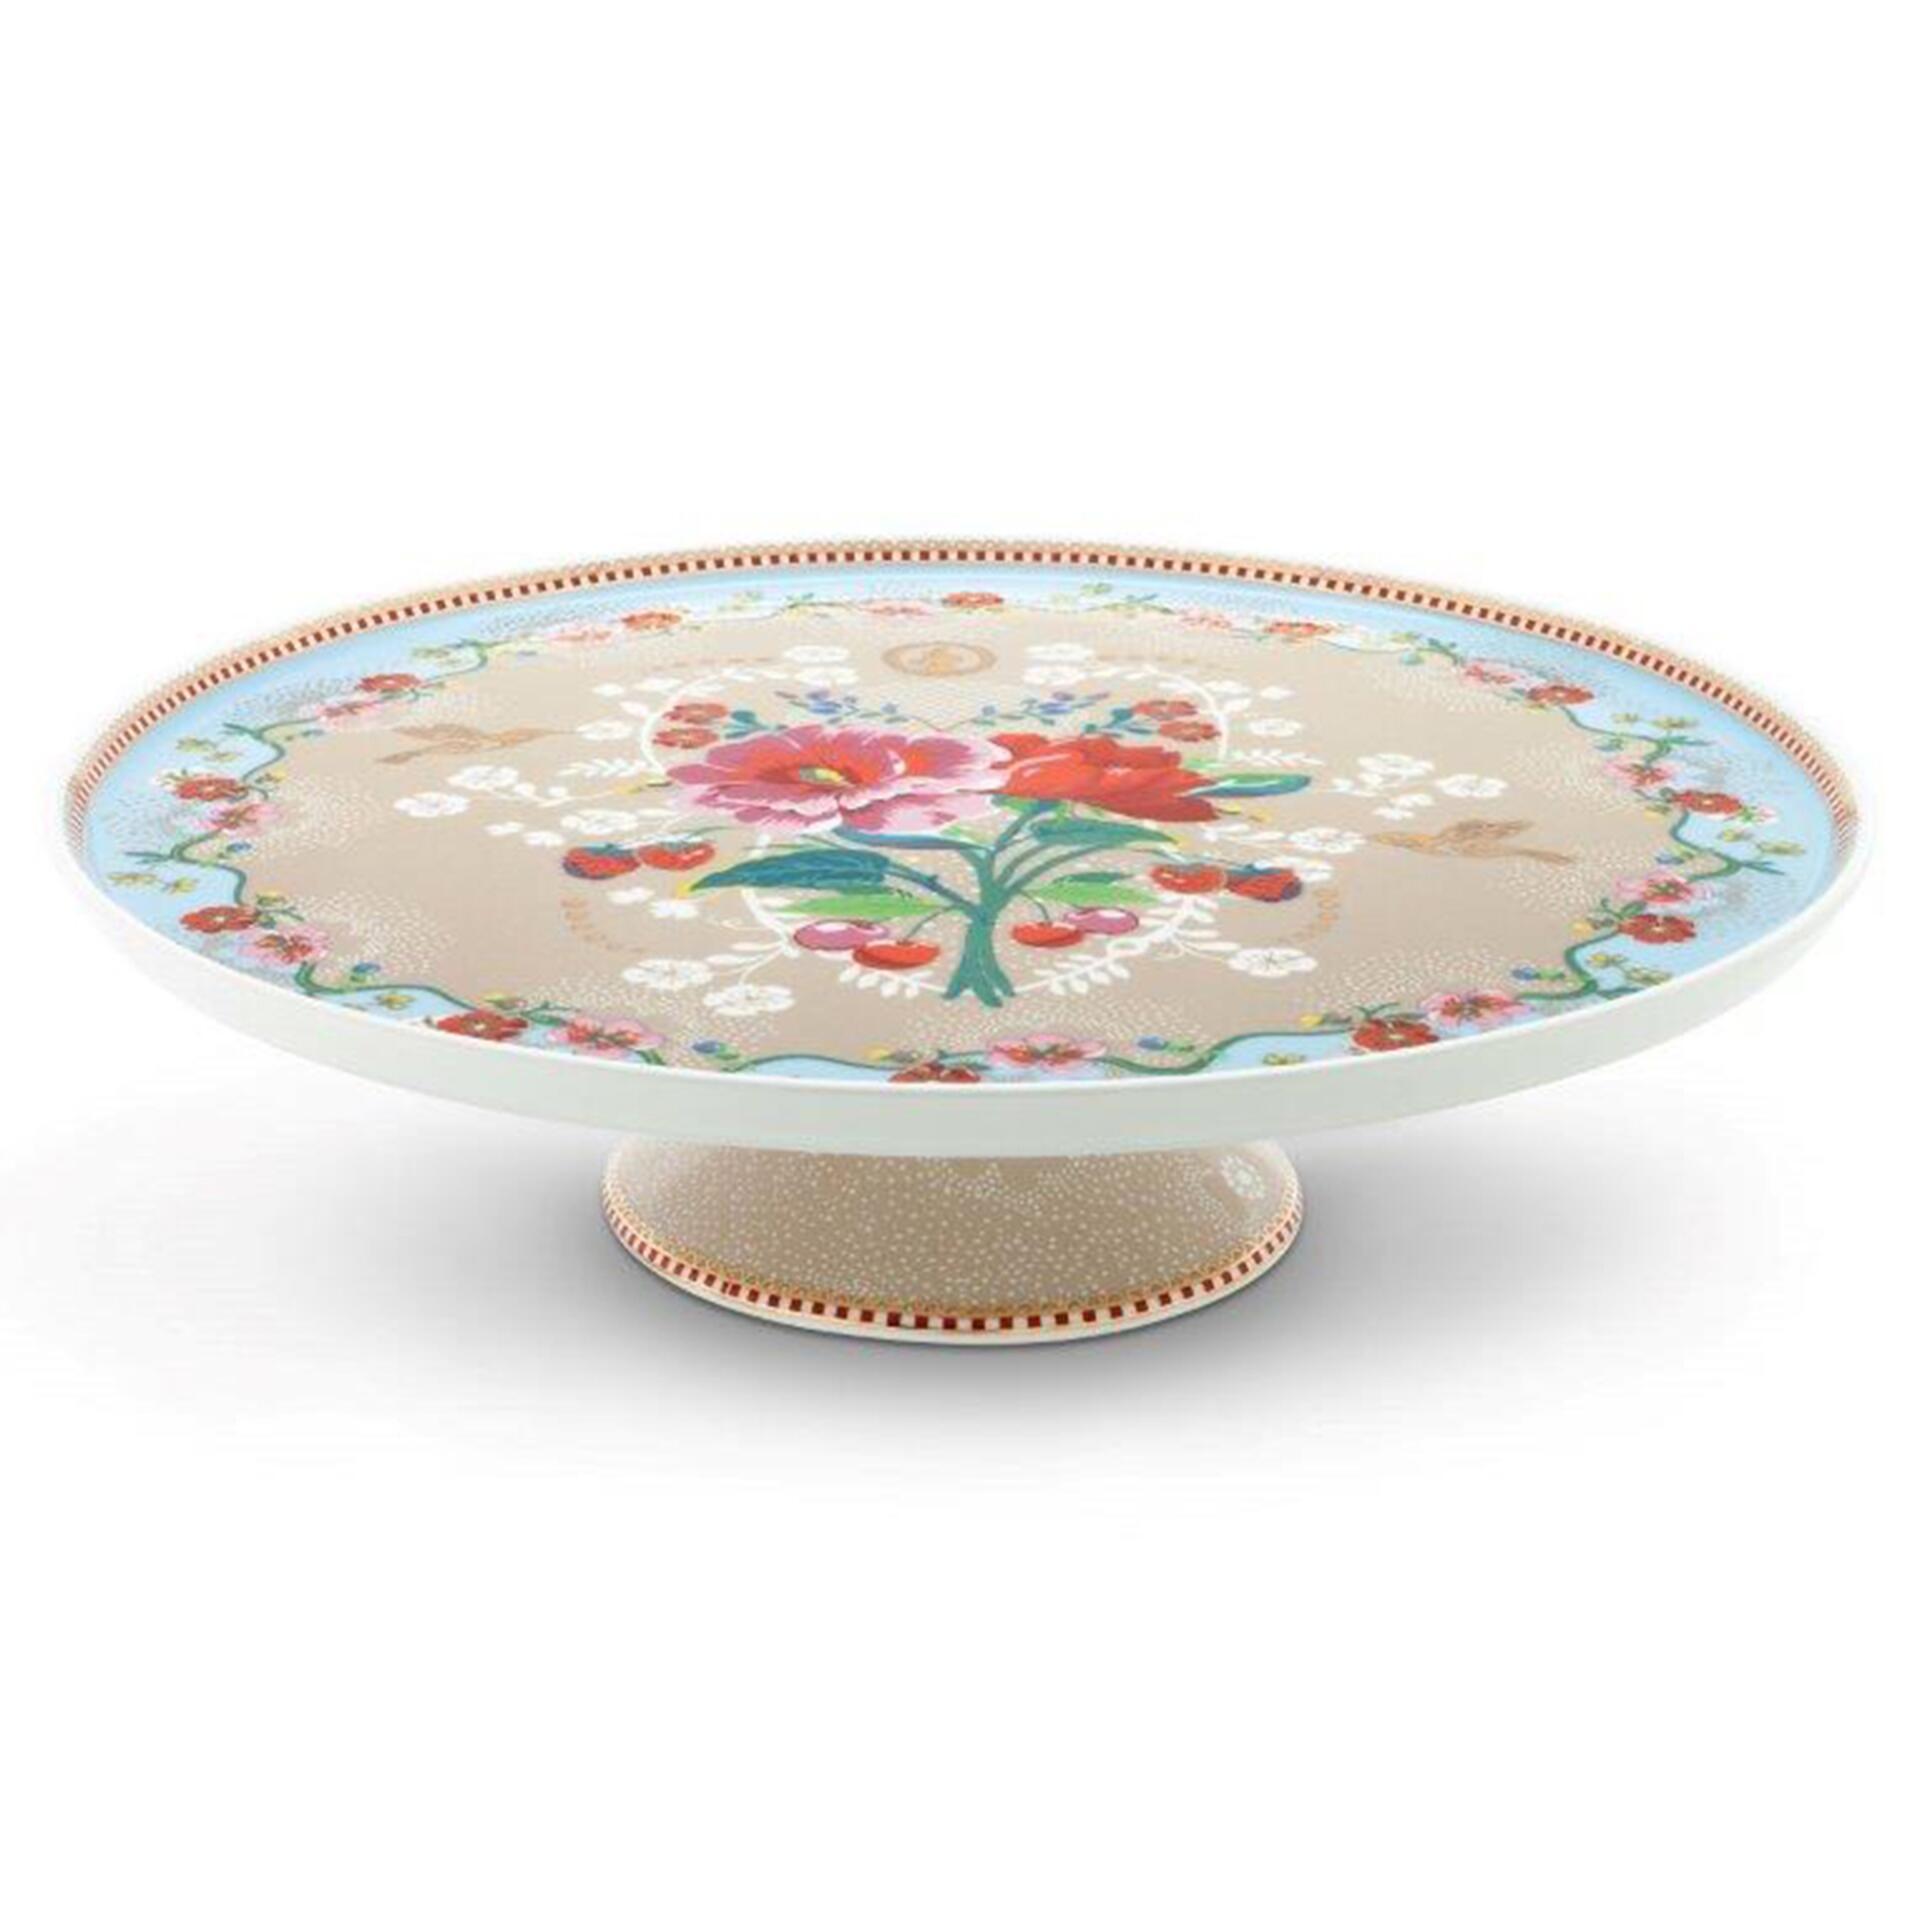 PiP Porzellan Tortenplatte Rose Khaki